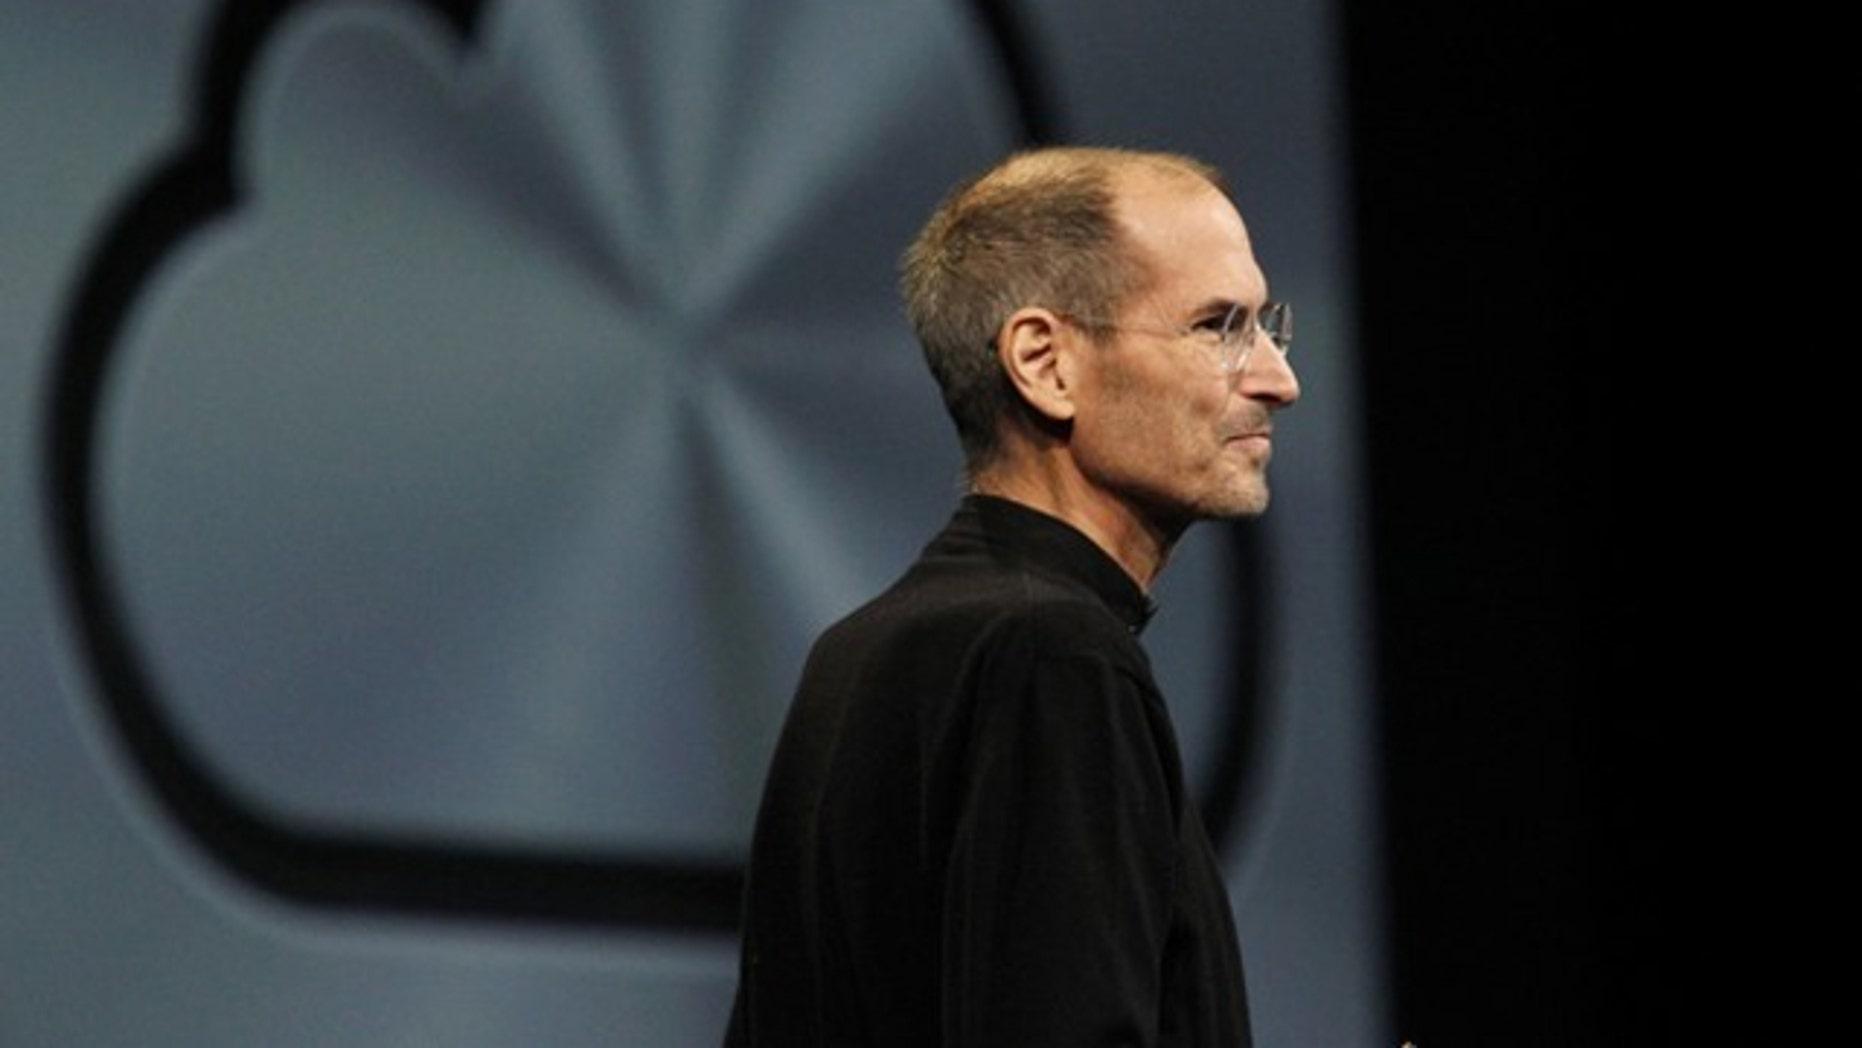 Steve Jobs announces iCloud at the WWDC 2011.